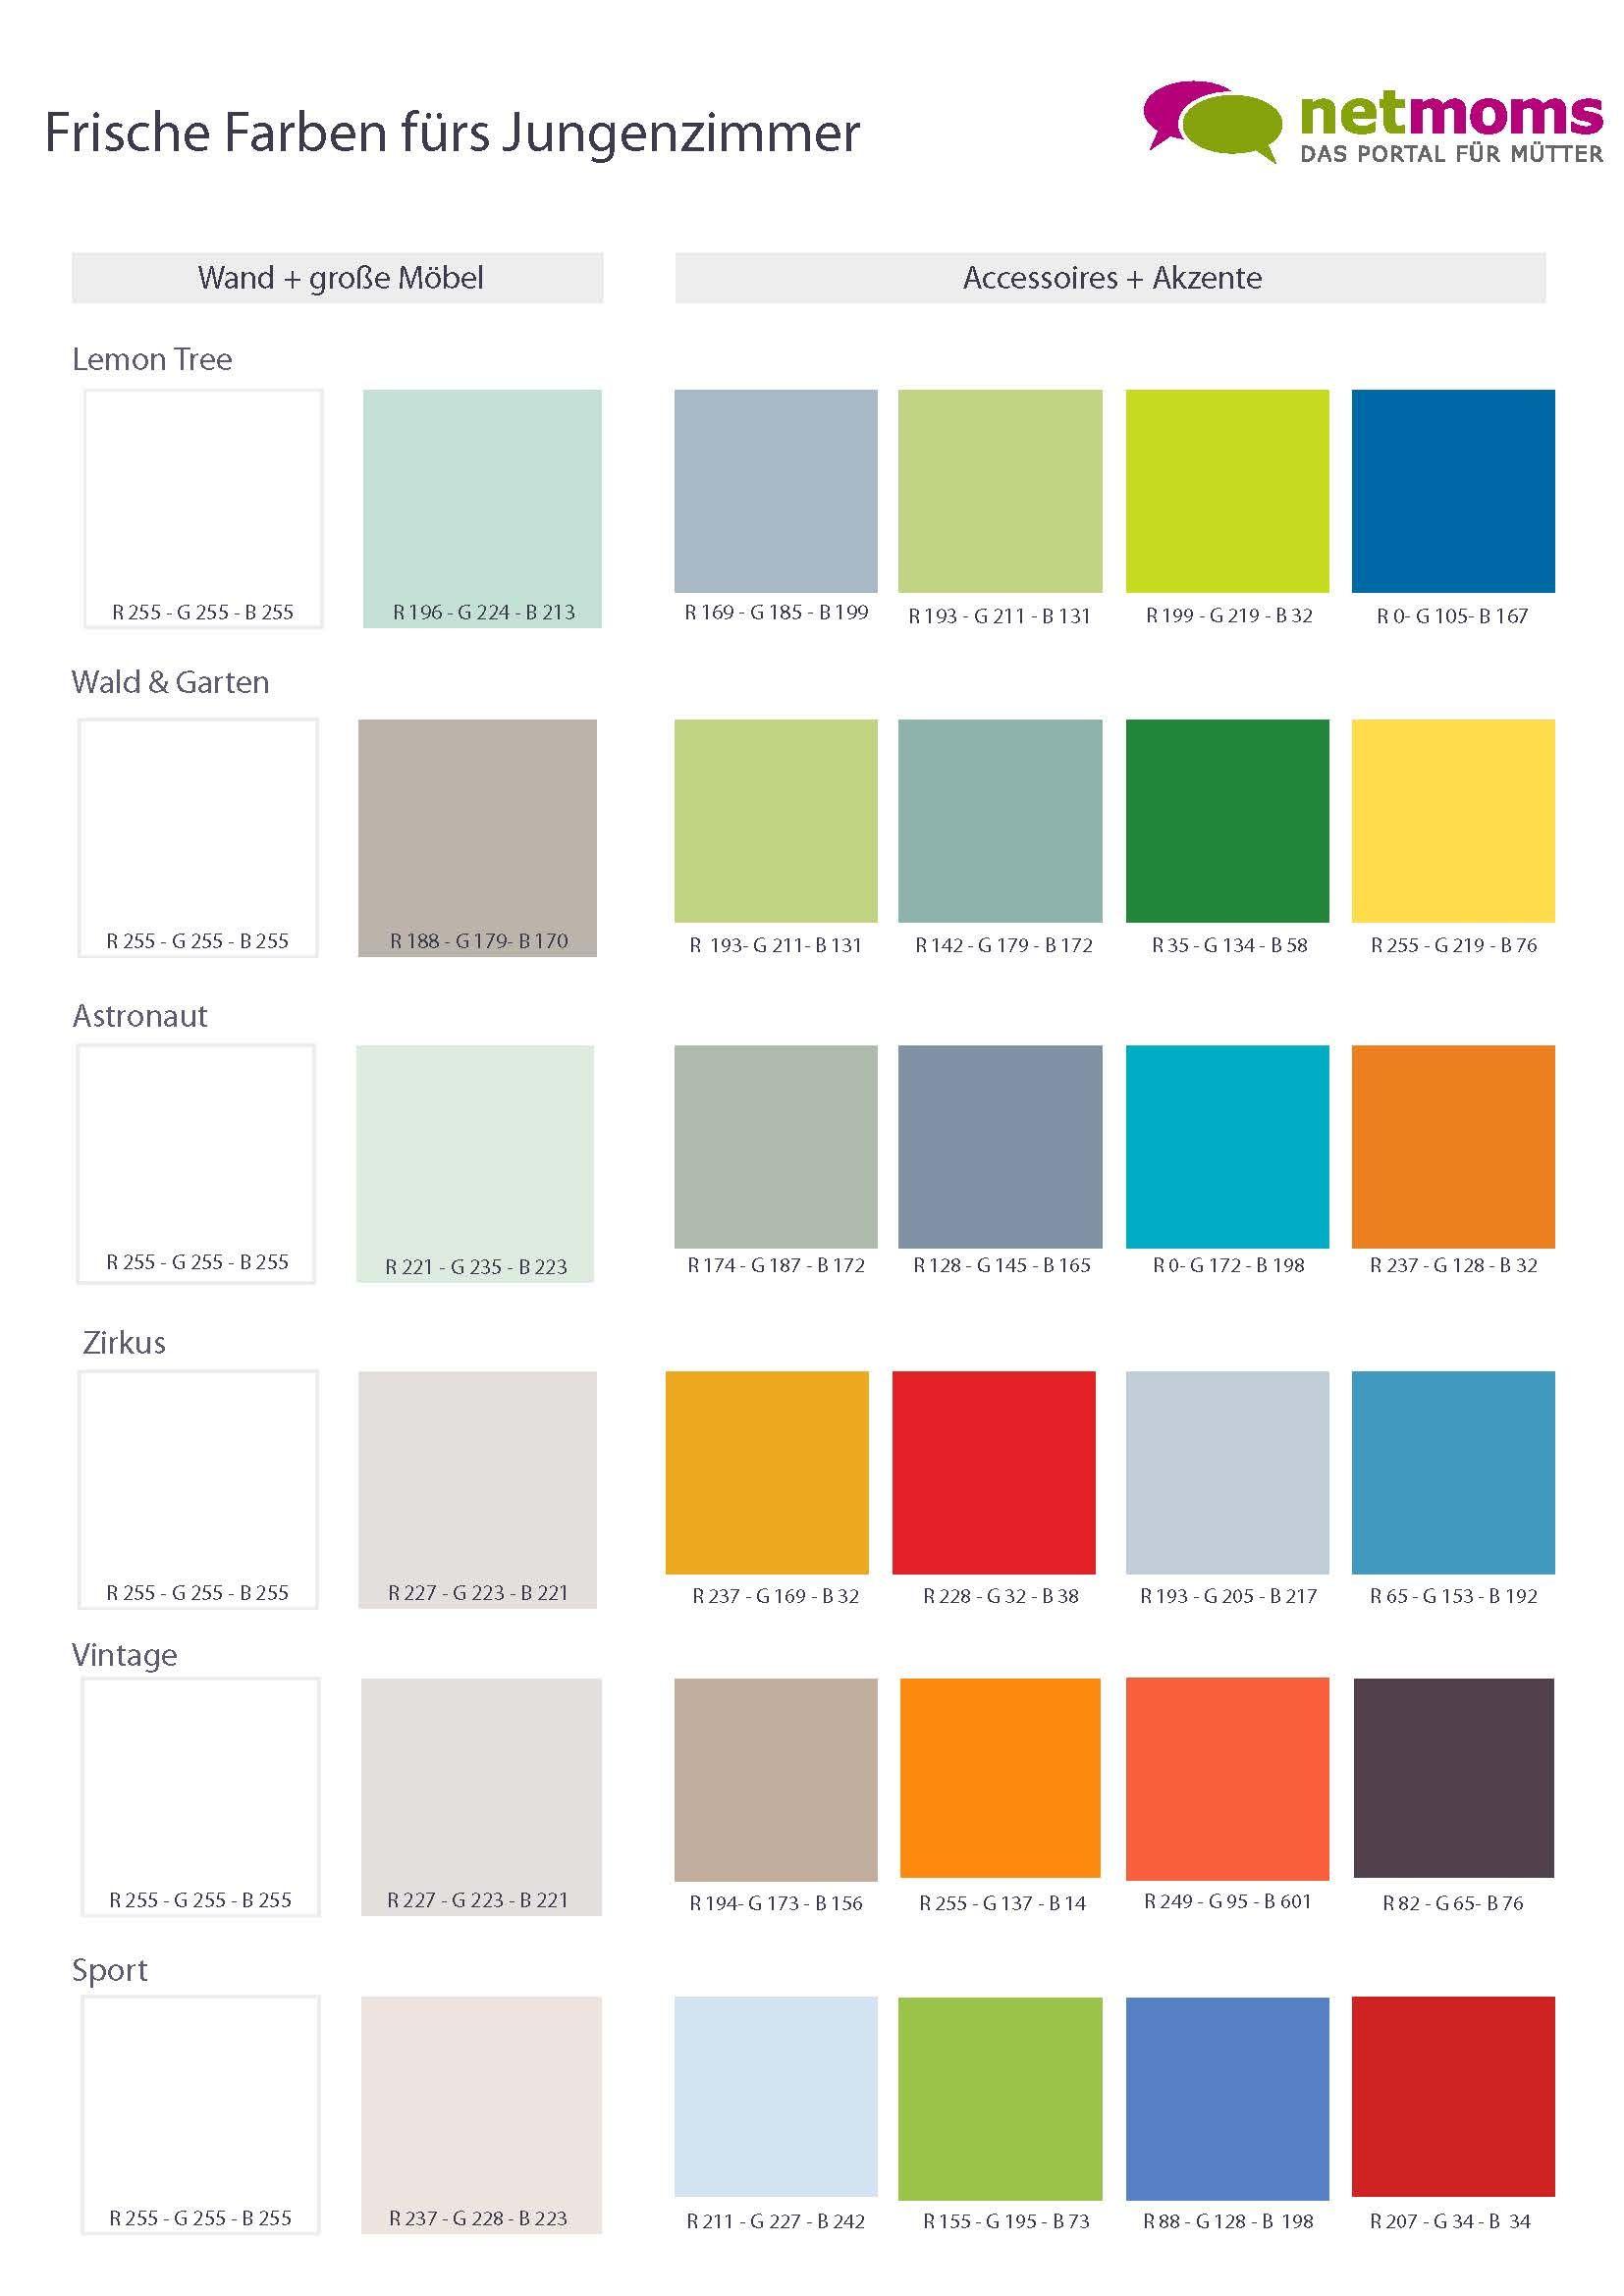 Farben im Kinderzimmer schön kombinieren | Babies, Kids rooms and Room